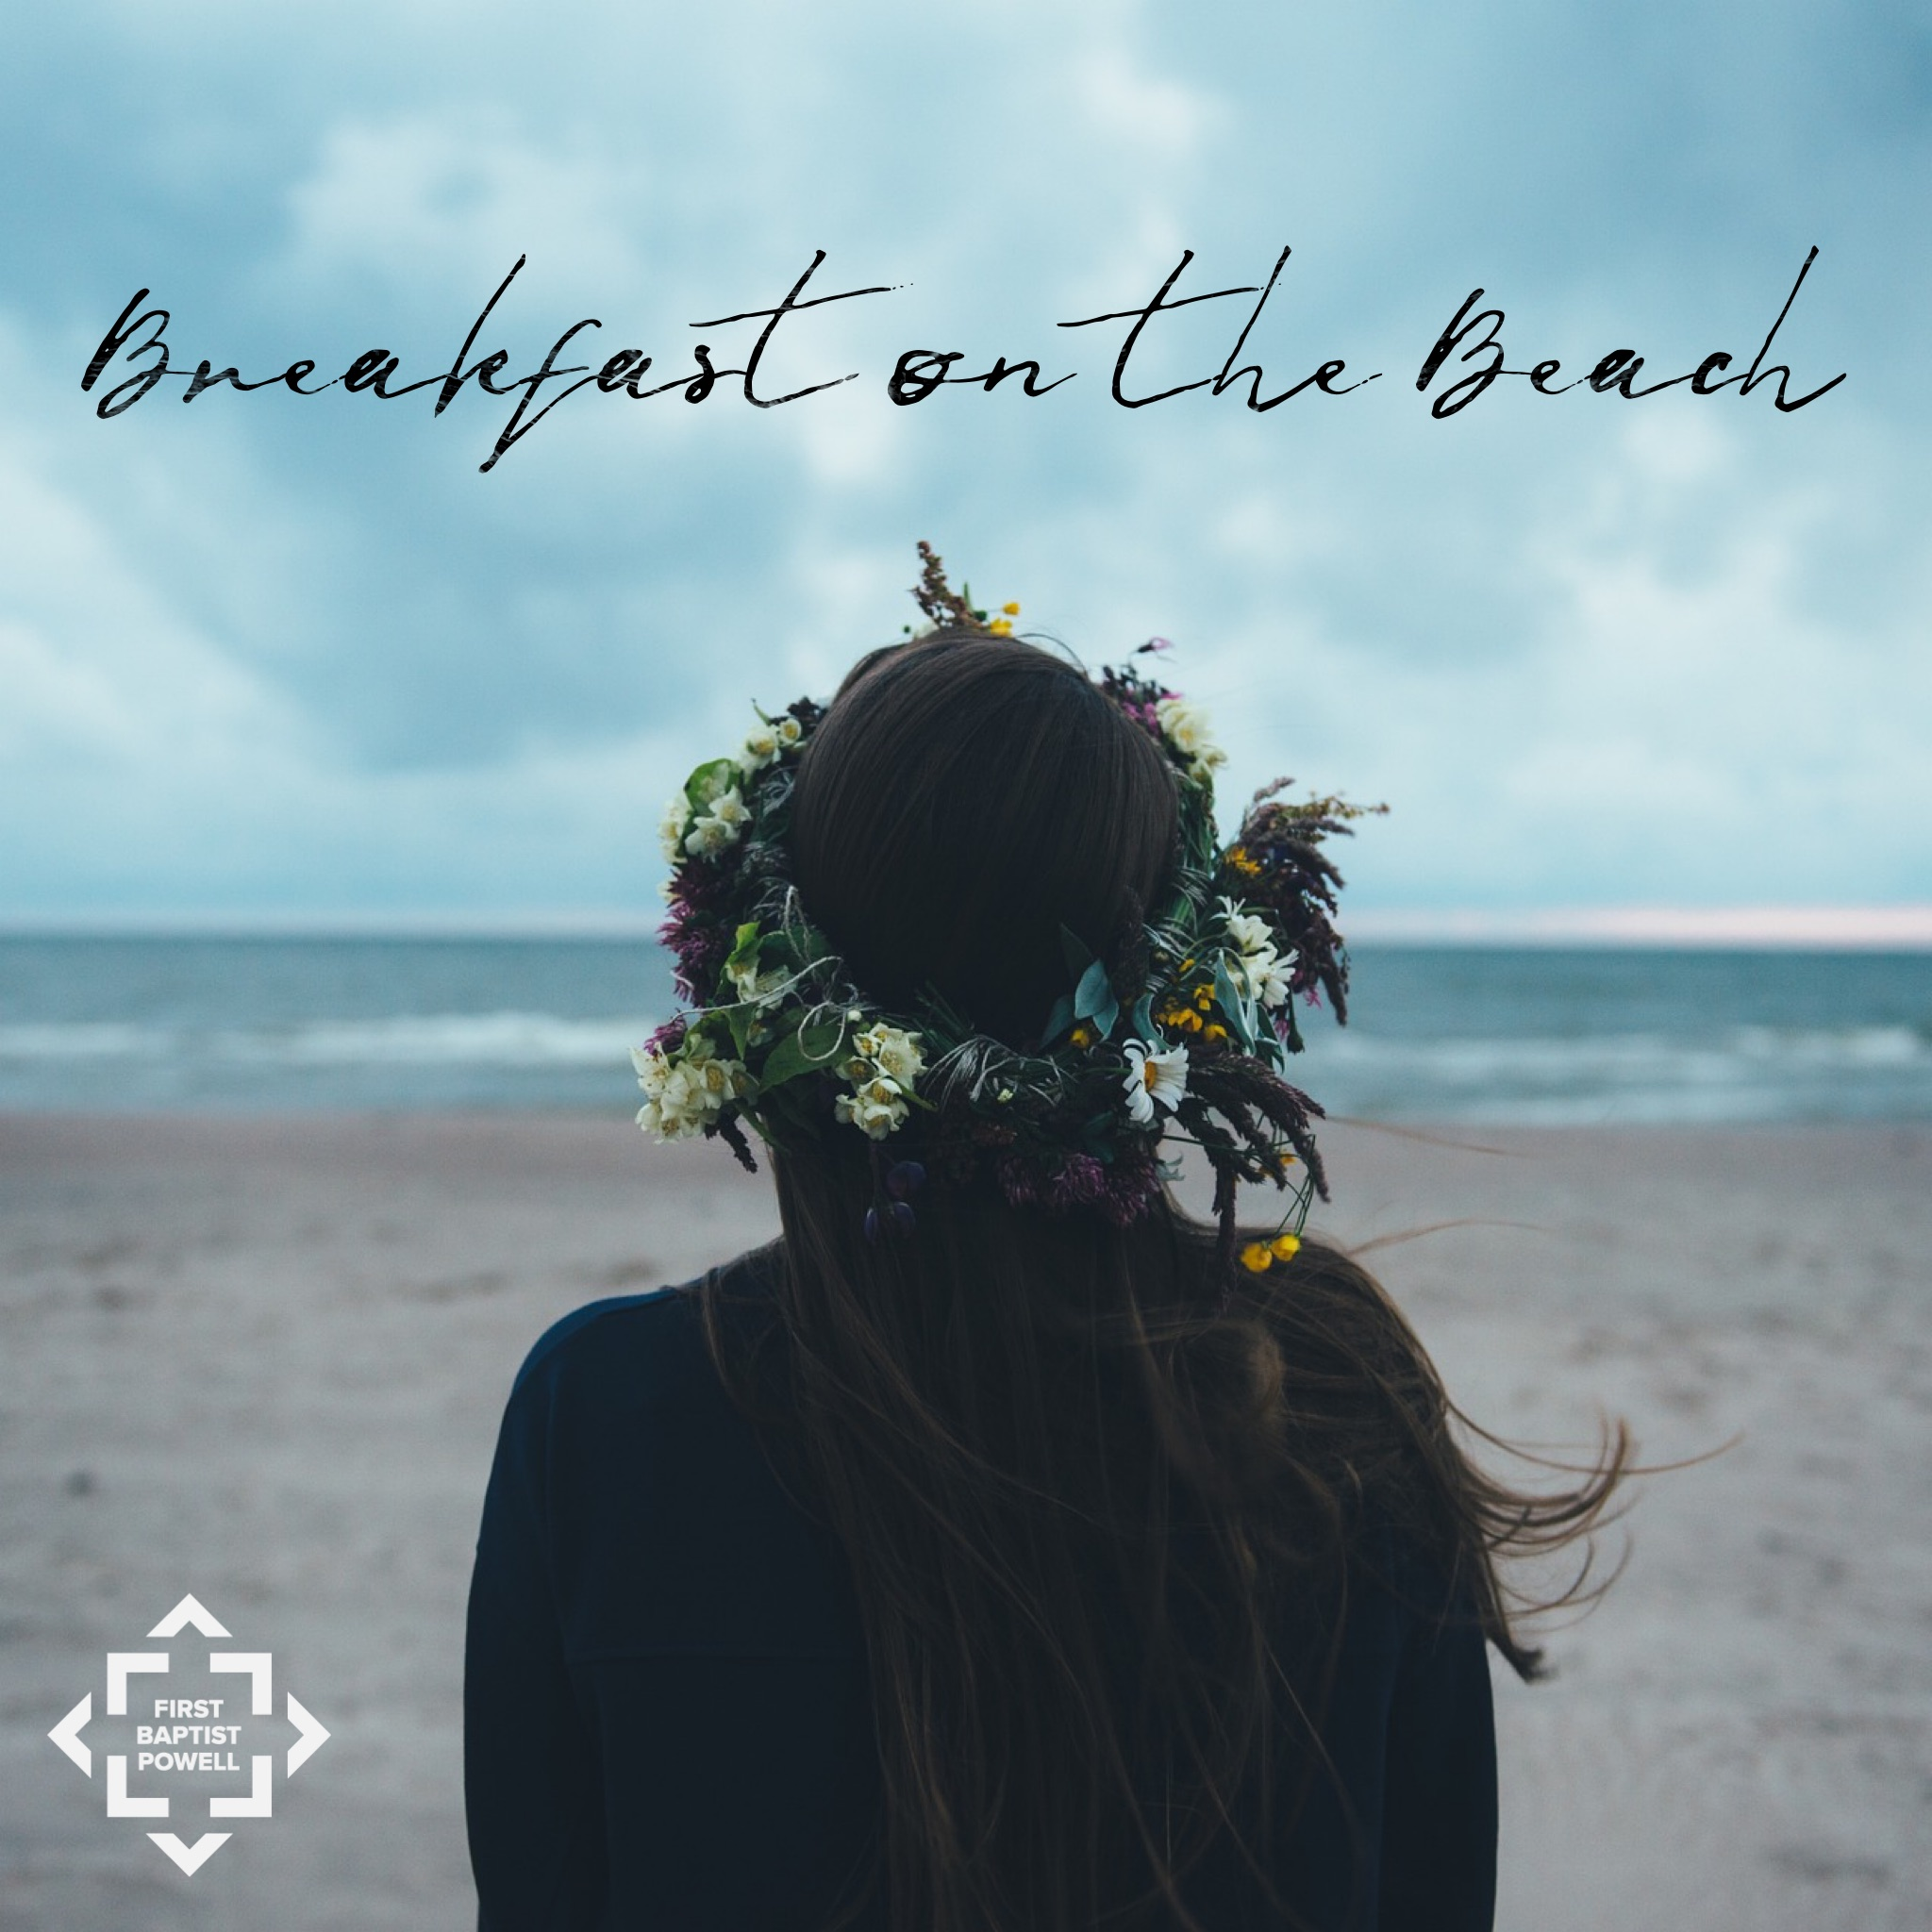 Breakfast on the Beach - First Baptist Powell